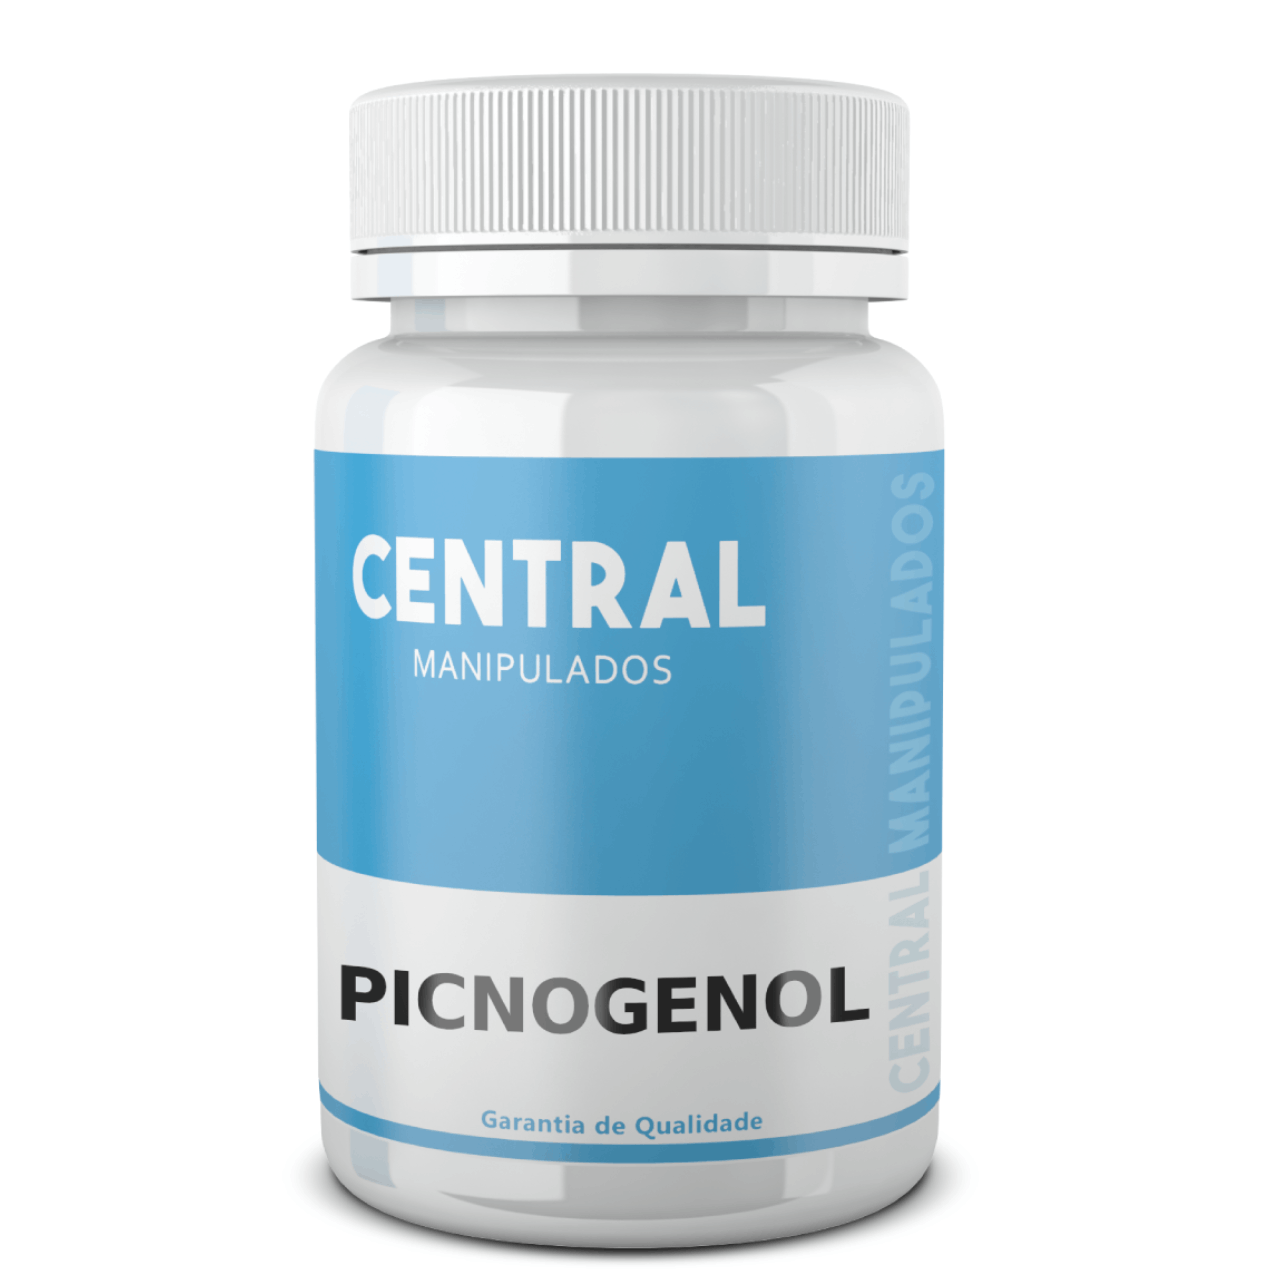 Picnogenol 150mg - 120 cápsulas - (pinus Pinaster) Pycnogenol - ANTIOXIDANTE